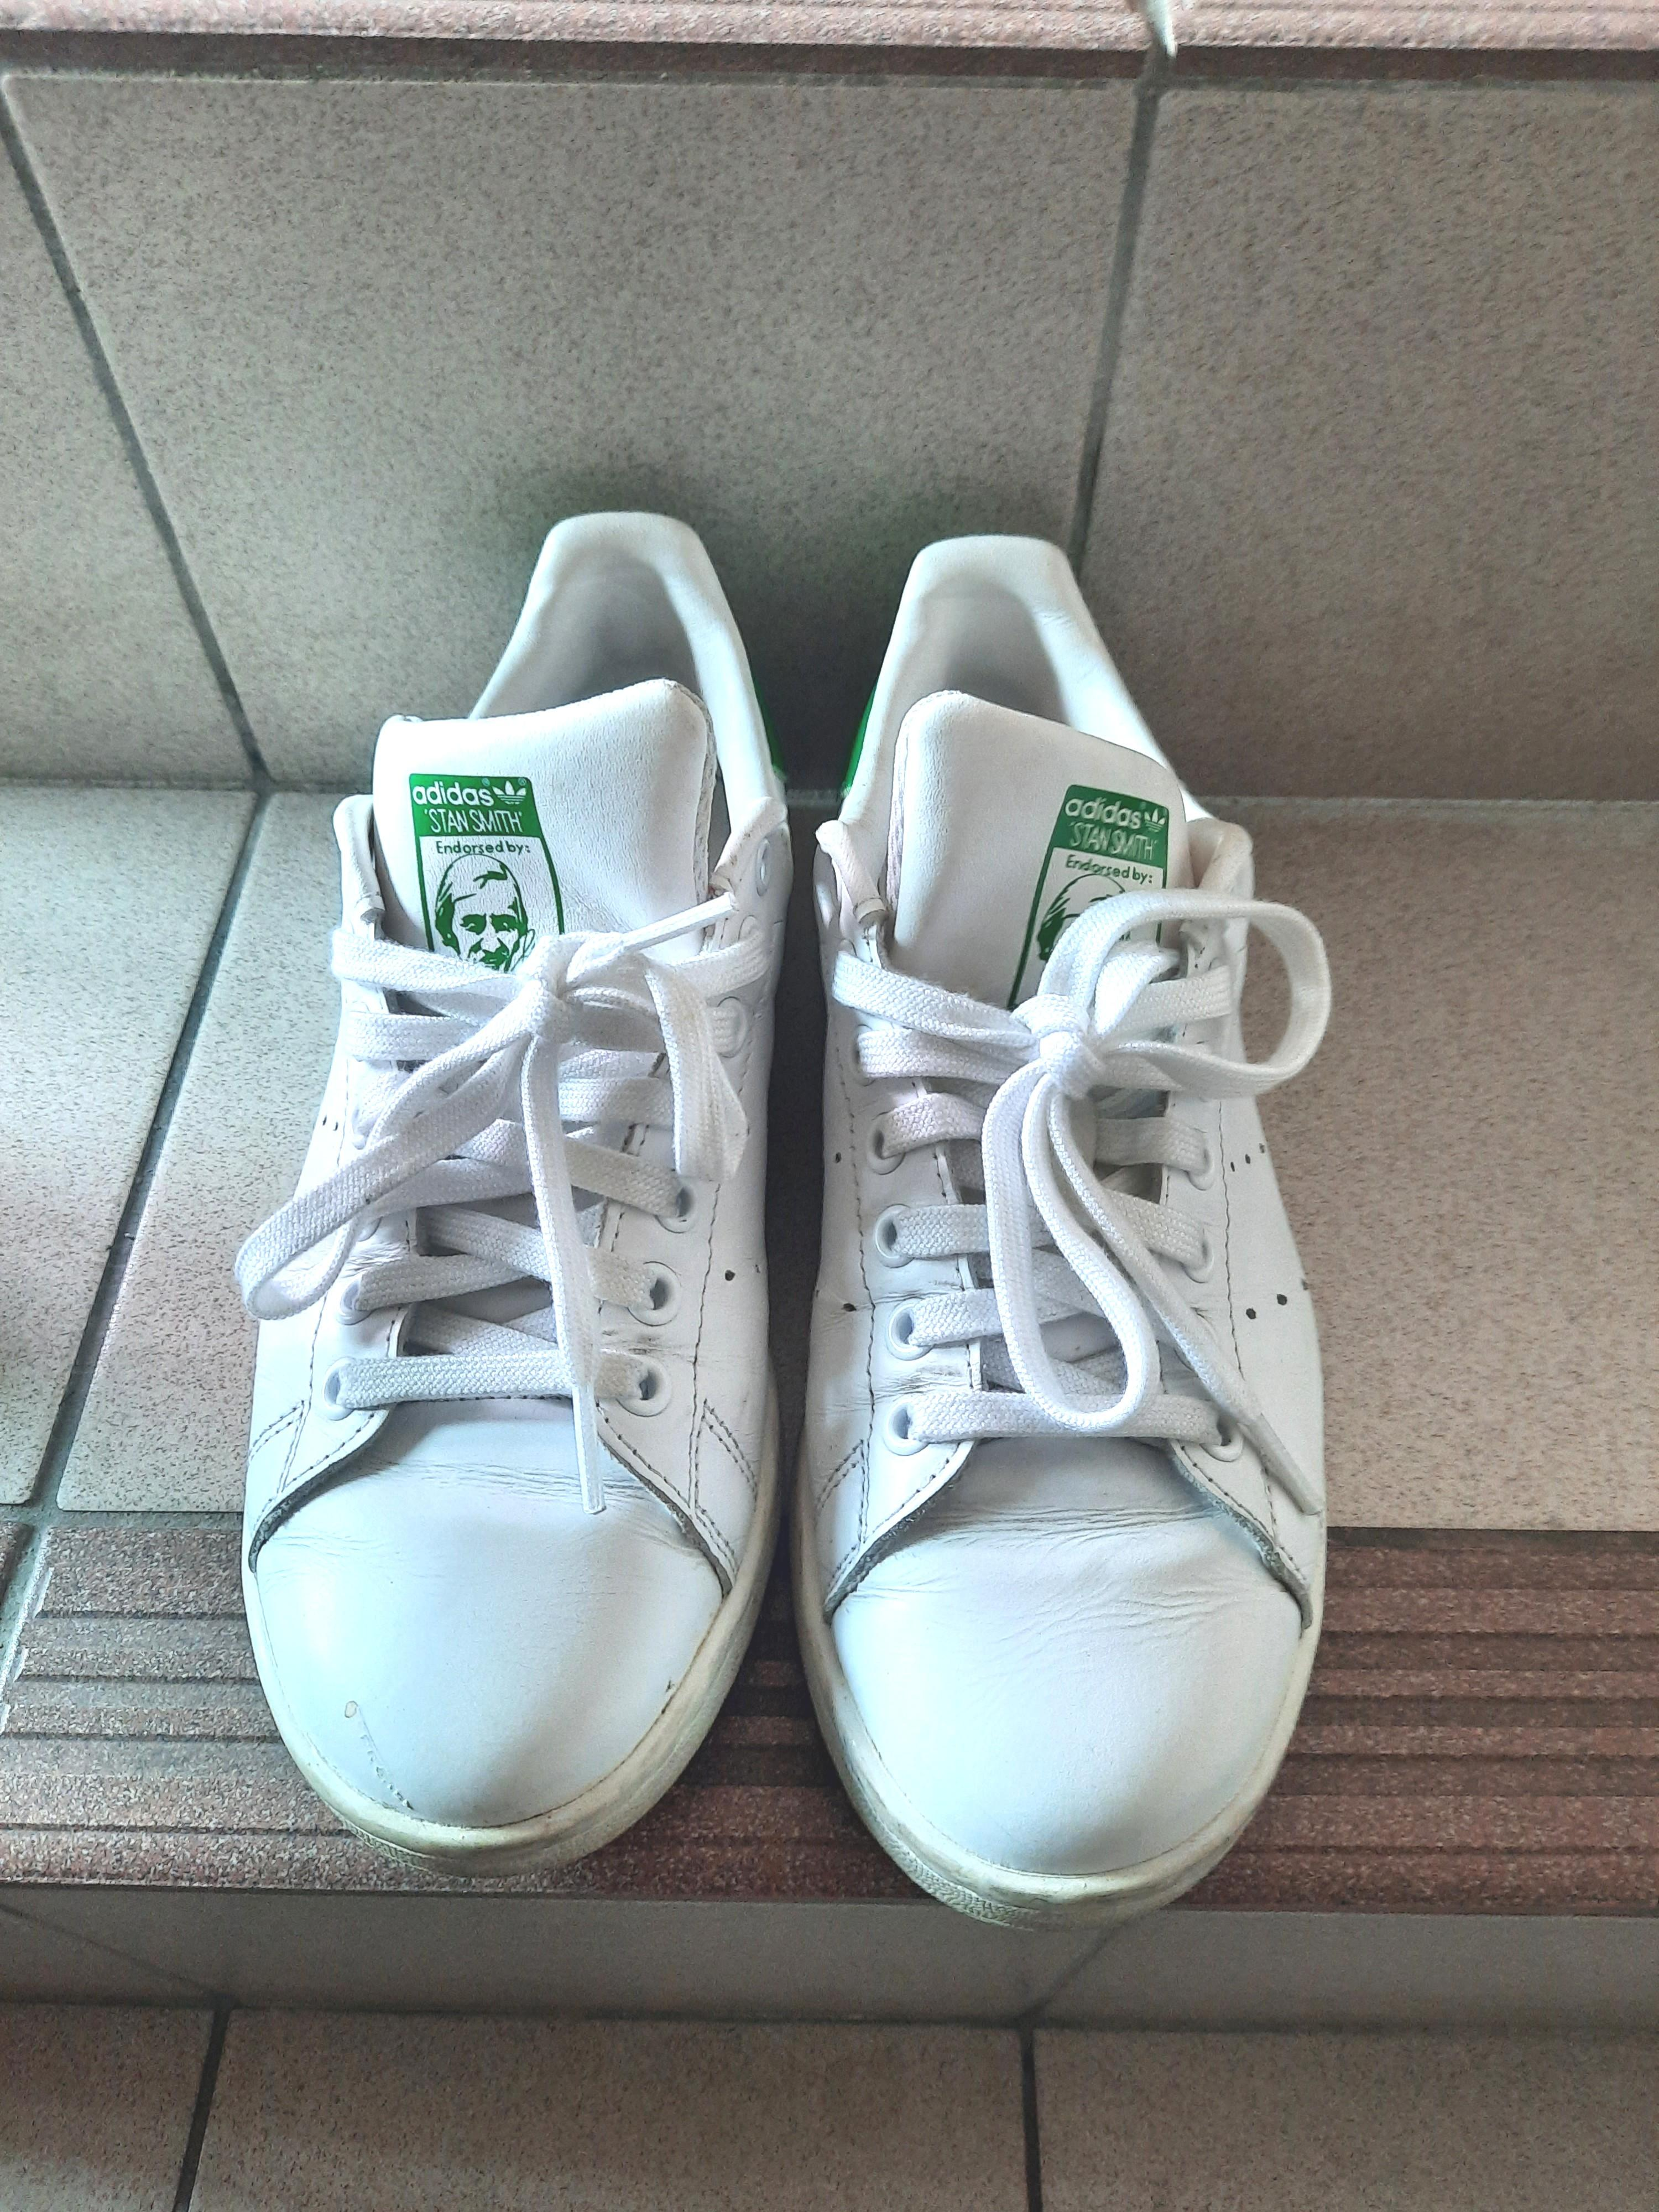 Adidas Stan Smith 運動鞋 球鞋 23.5cm